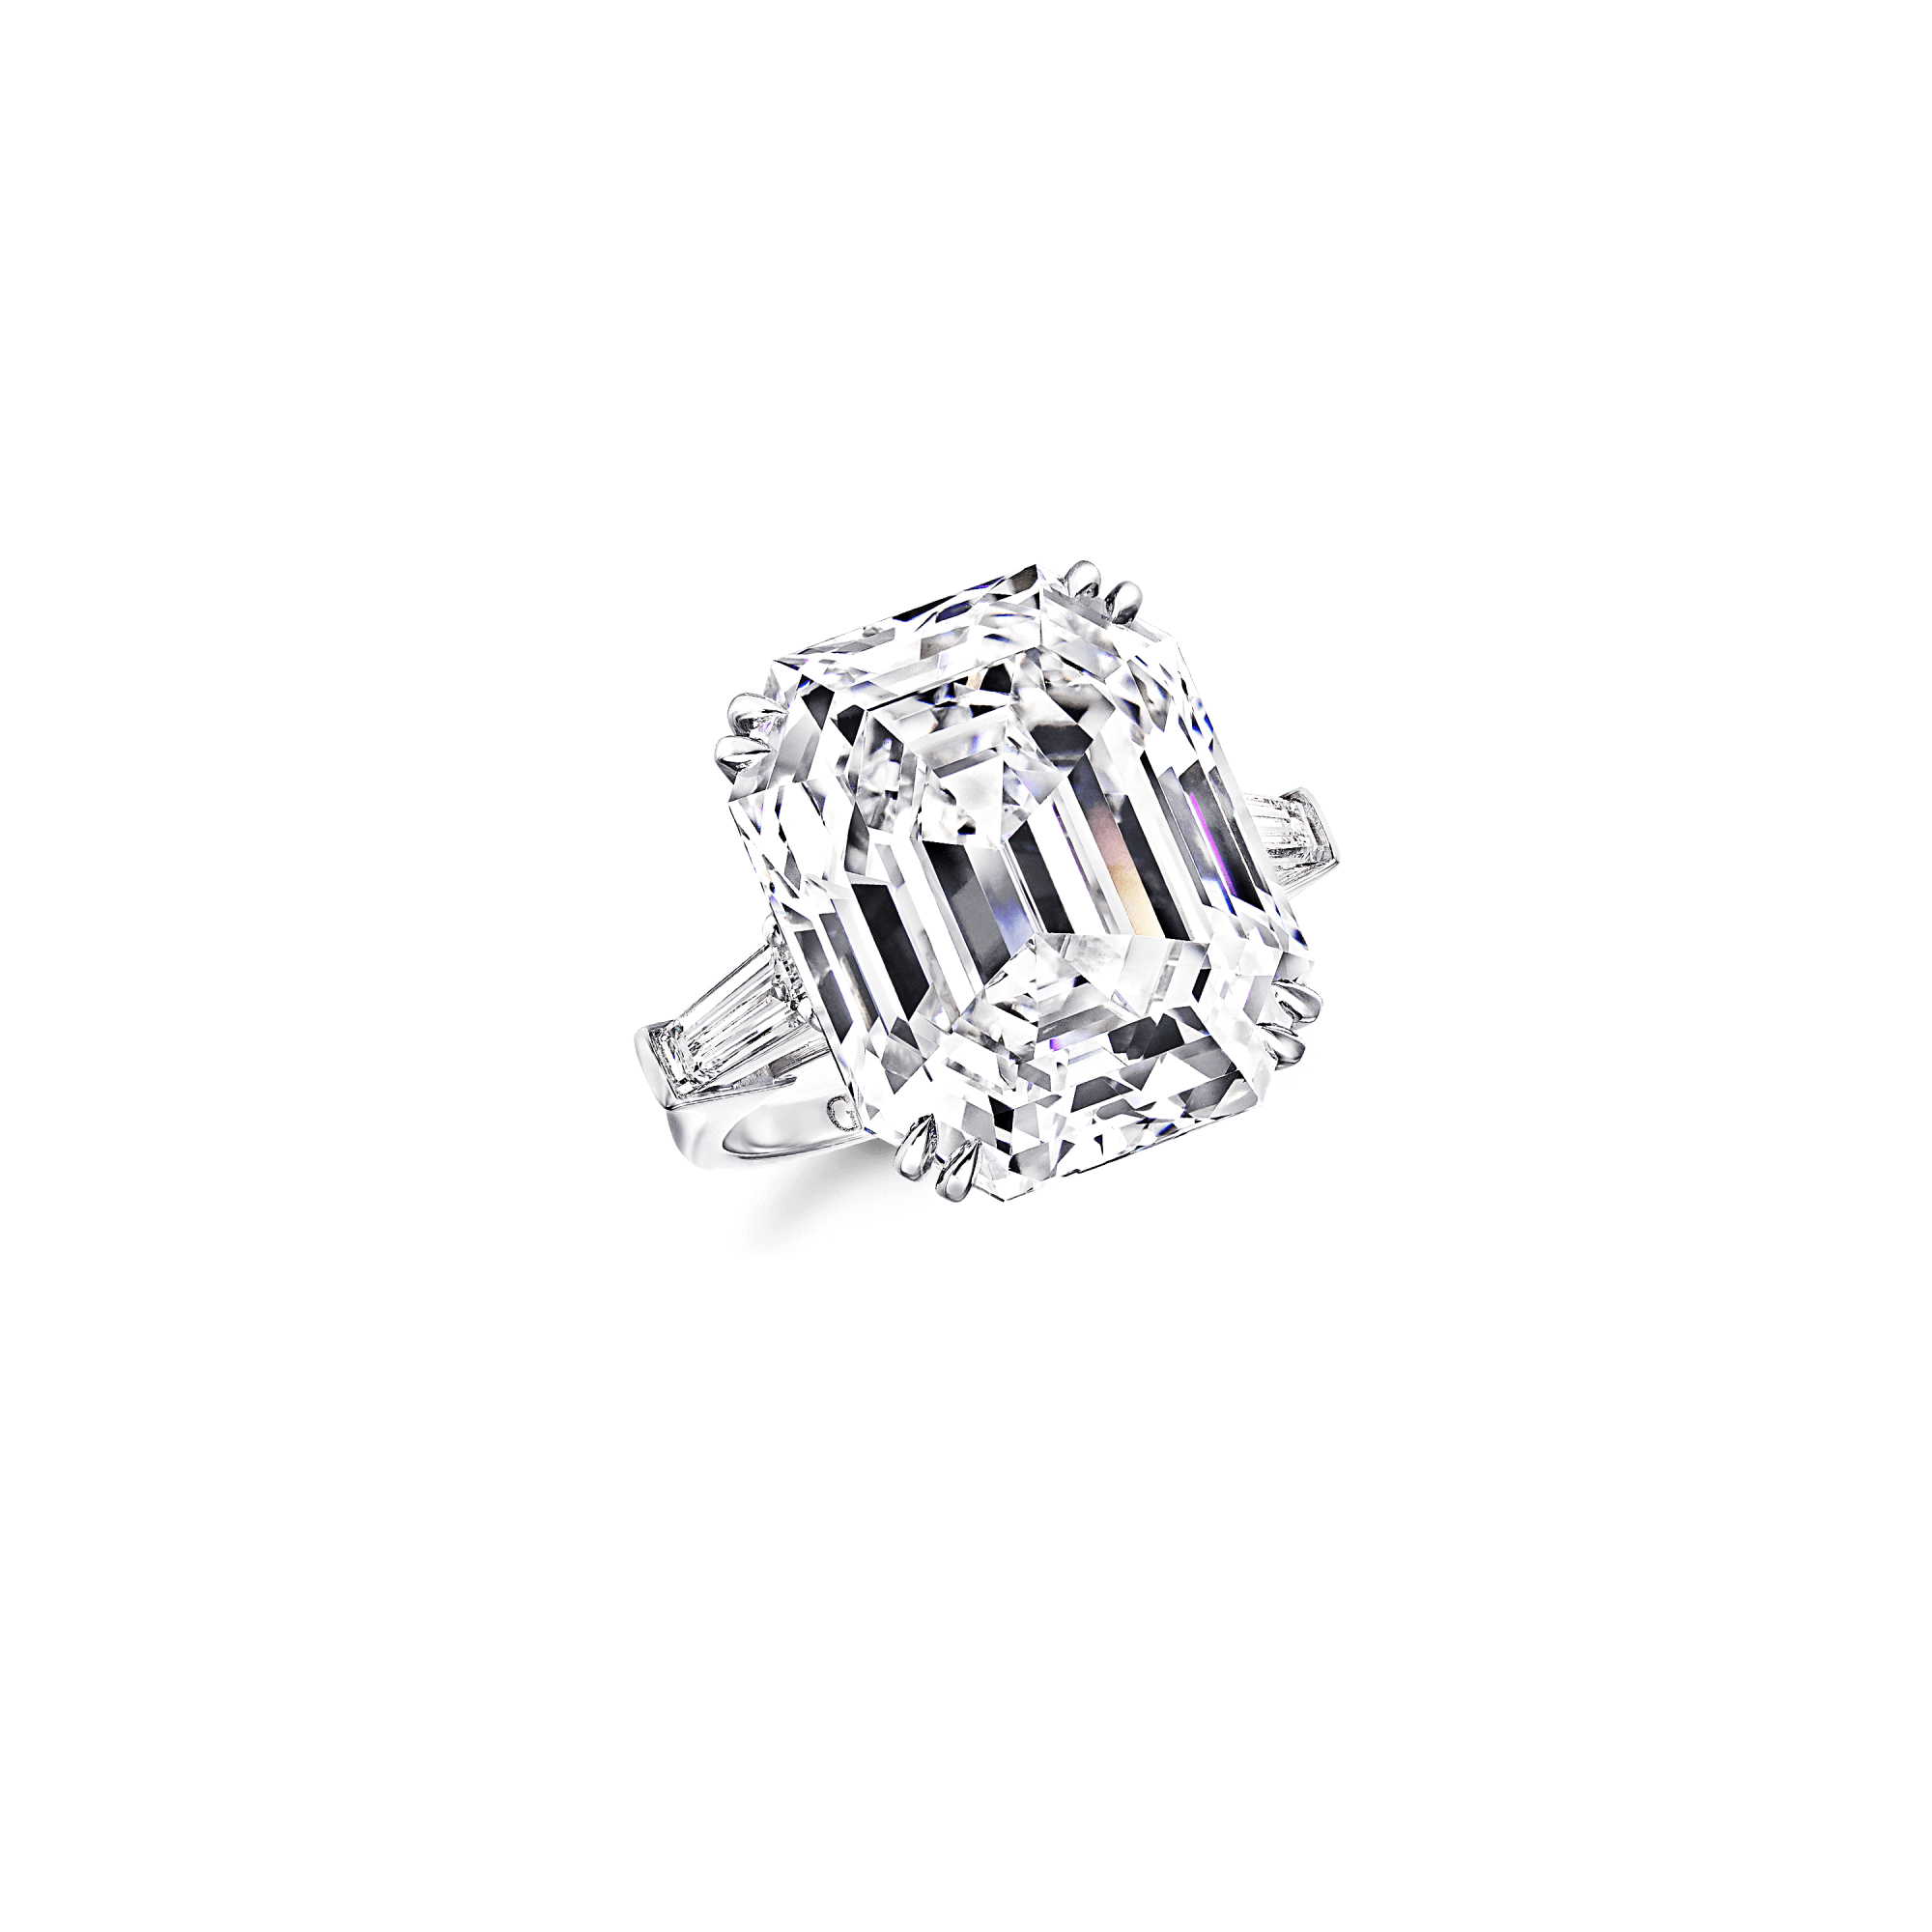 clip free download Emerald Cut Diamond Ring